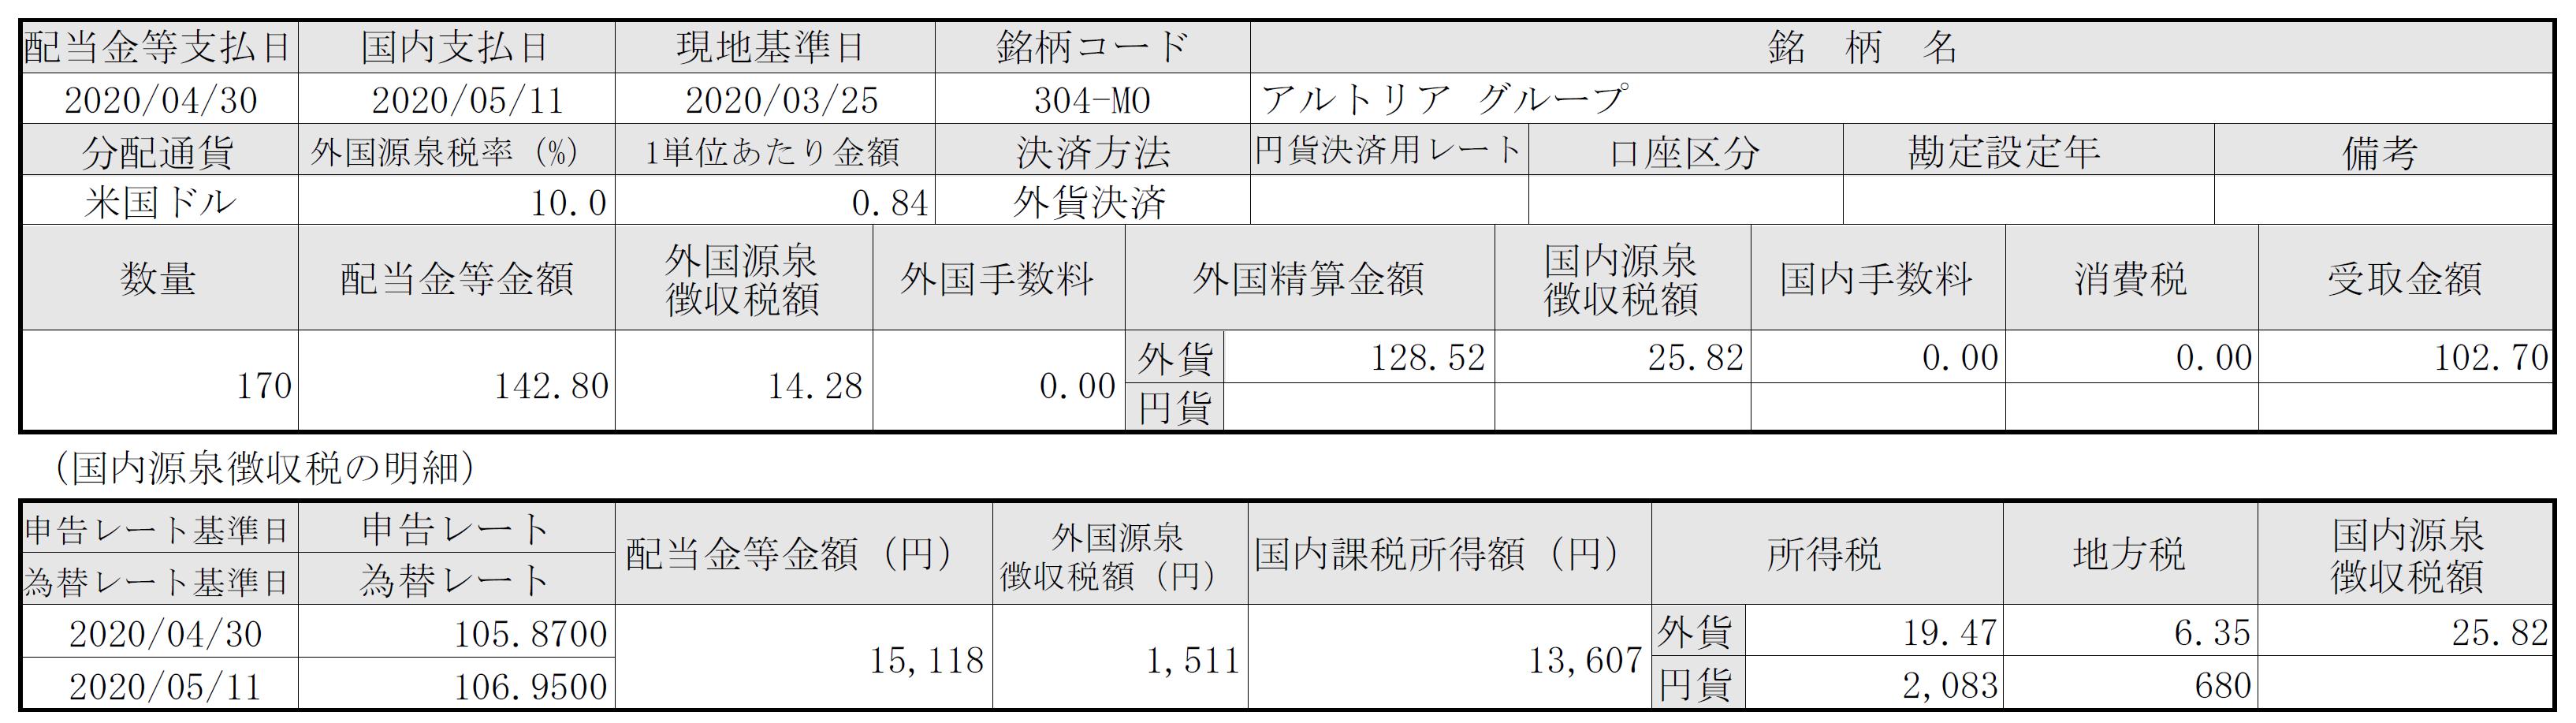 f:id:hodo-work:20200512214301p:plain